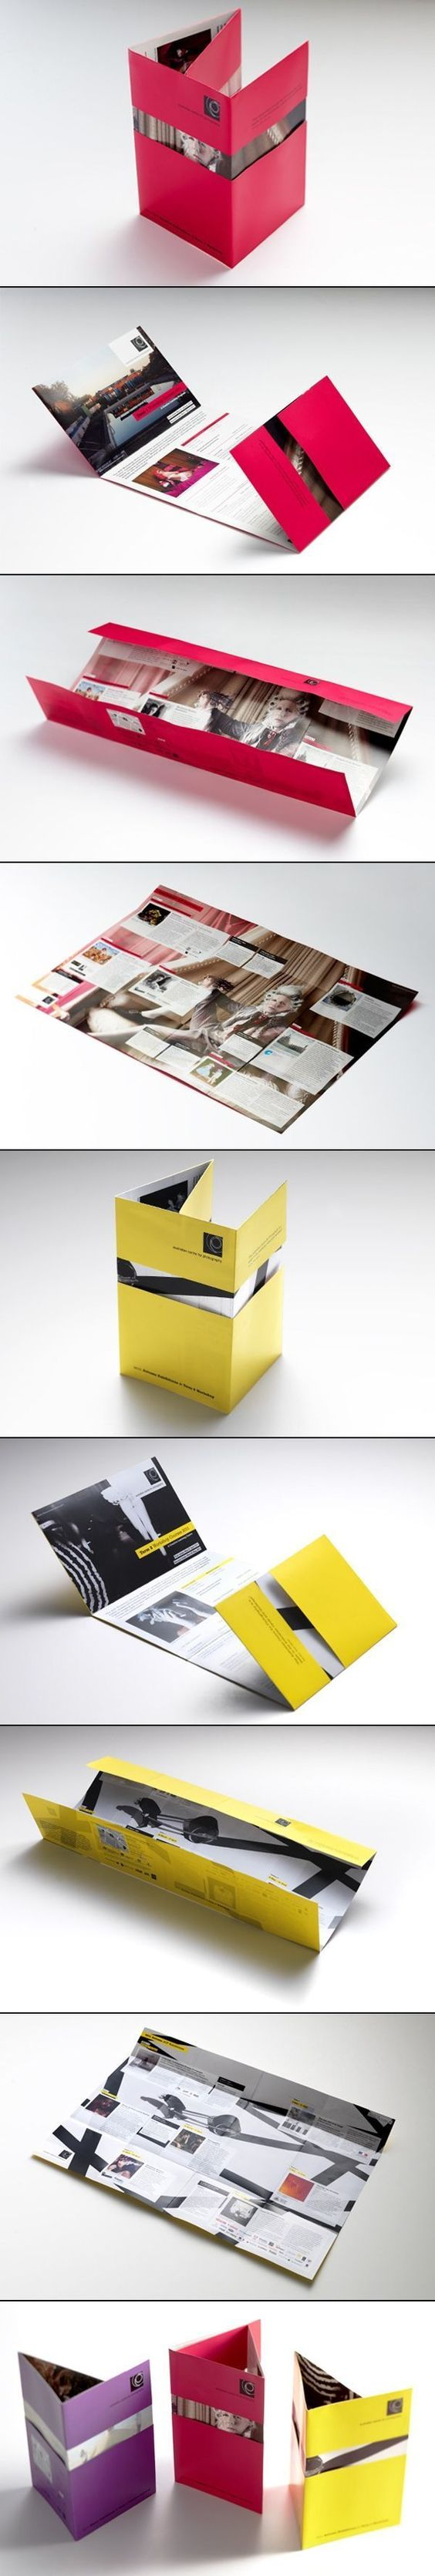 folding examples